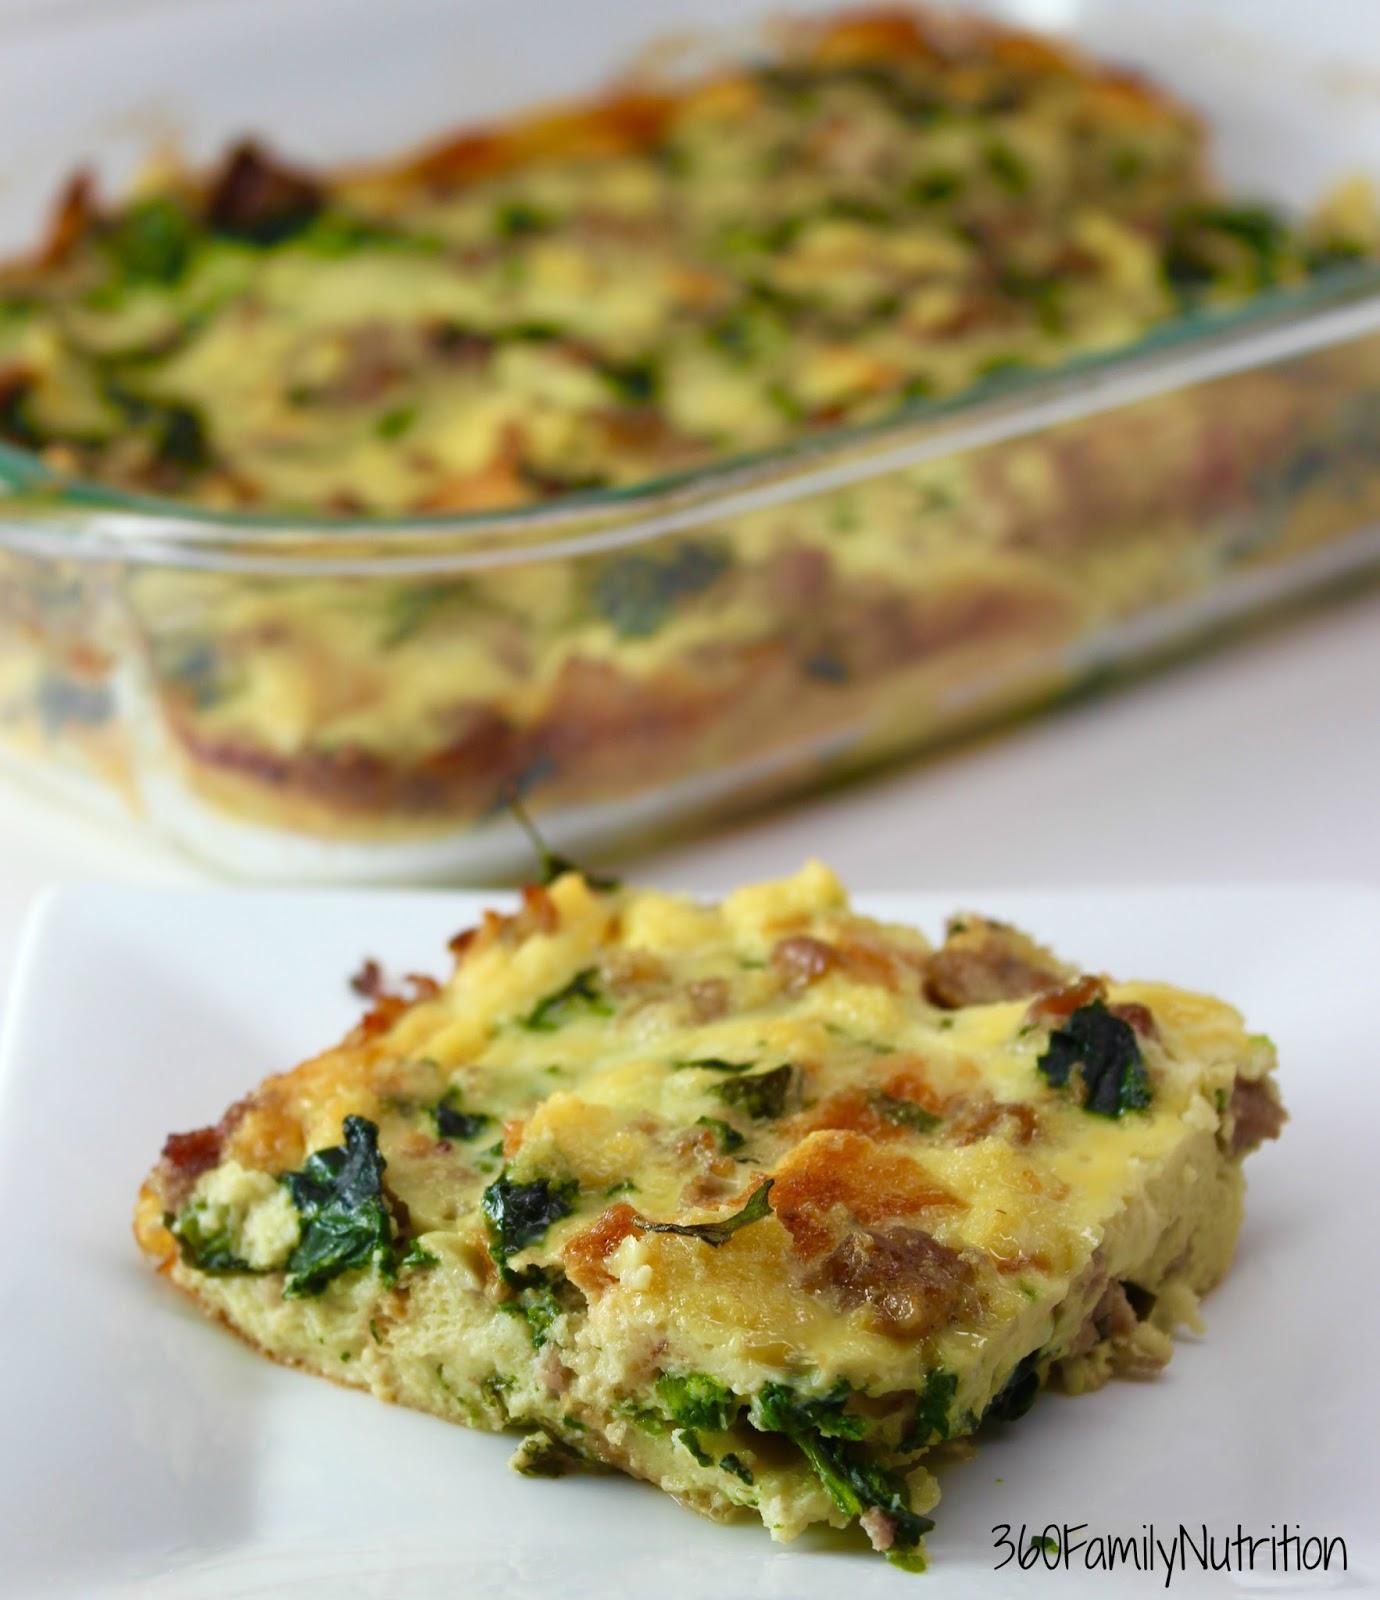 Make Ahead Sausage And Egg Breakfast Bake: Overnight Egg, Spinach And Sausage Bake